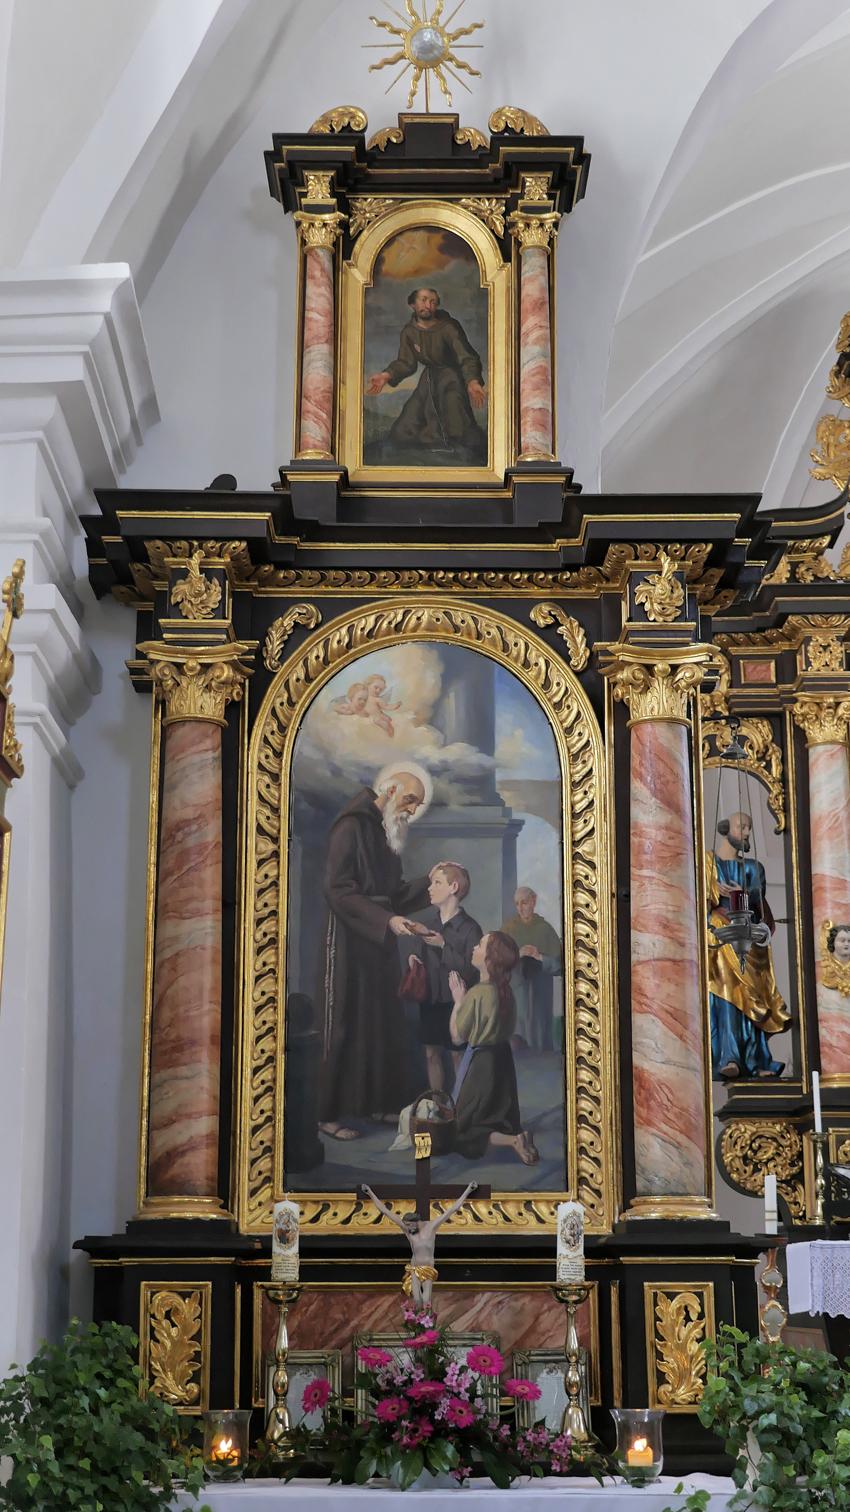 2021 04 26 aoelfb wallfahrtskirche mariae himmelfahrt atzberg13